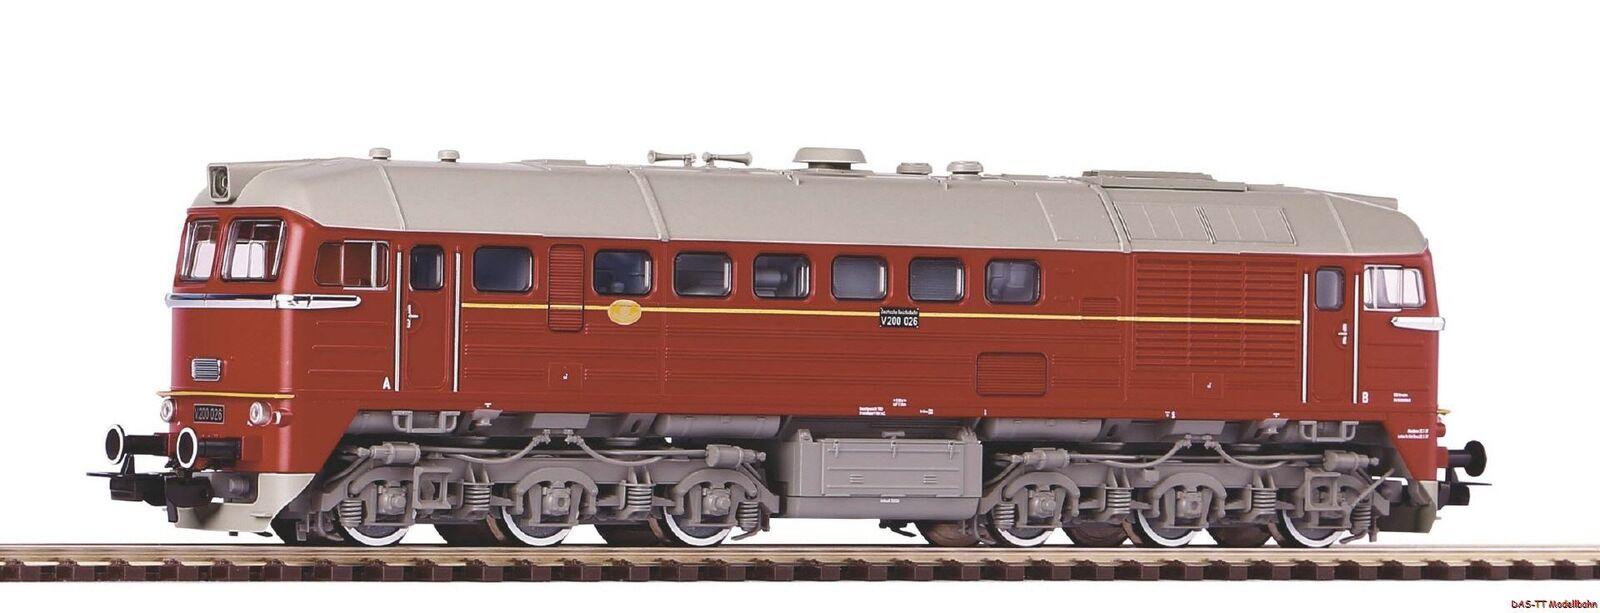 H0 diesellok V 200 Dr EP. III Piko 52800